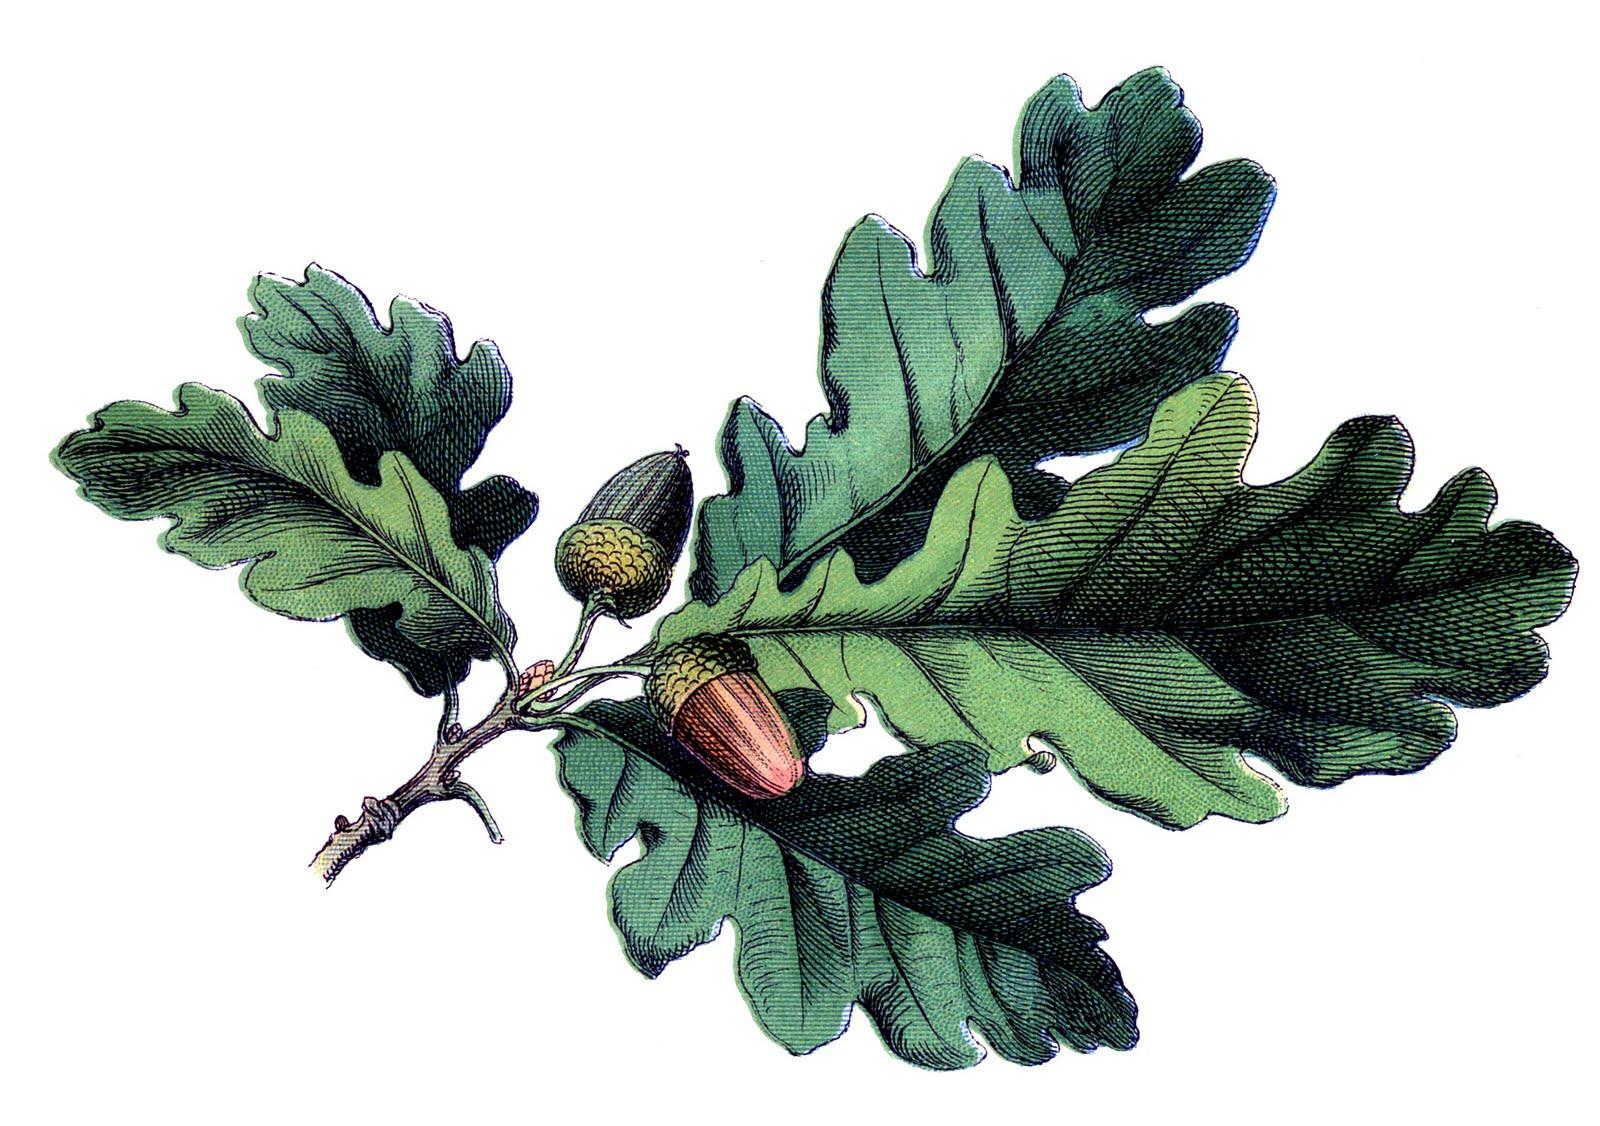 Acorn clipart oak leave. Antique botanical image leaves